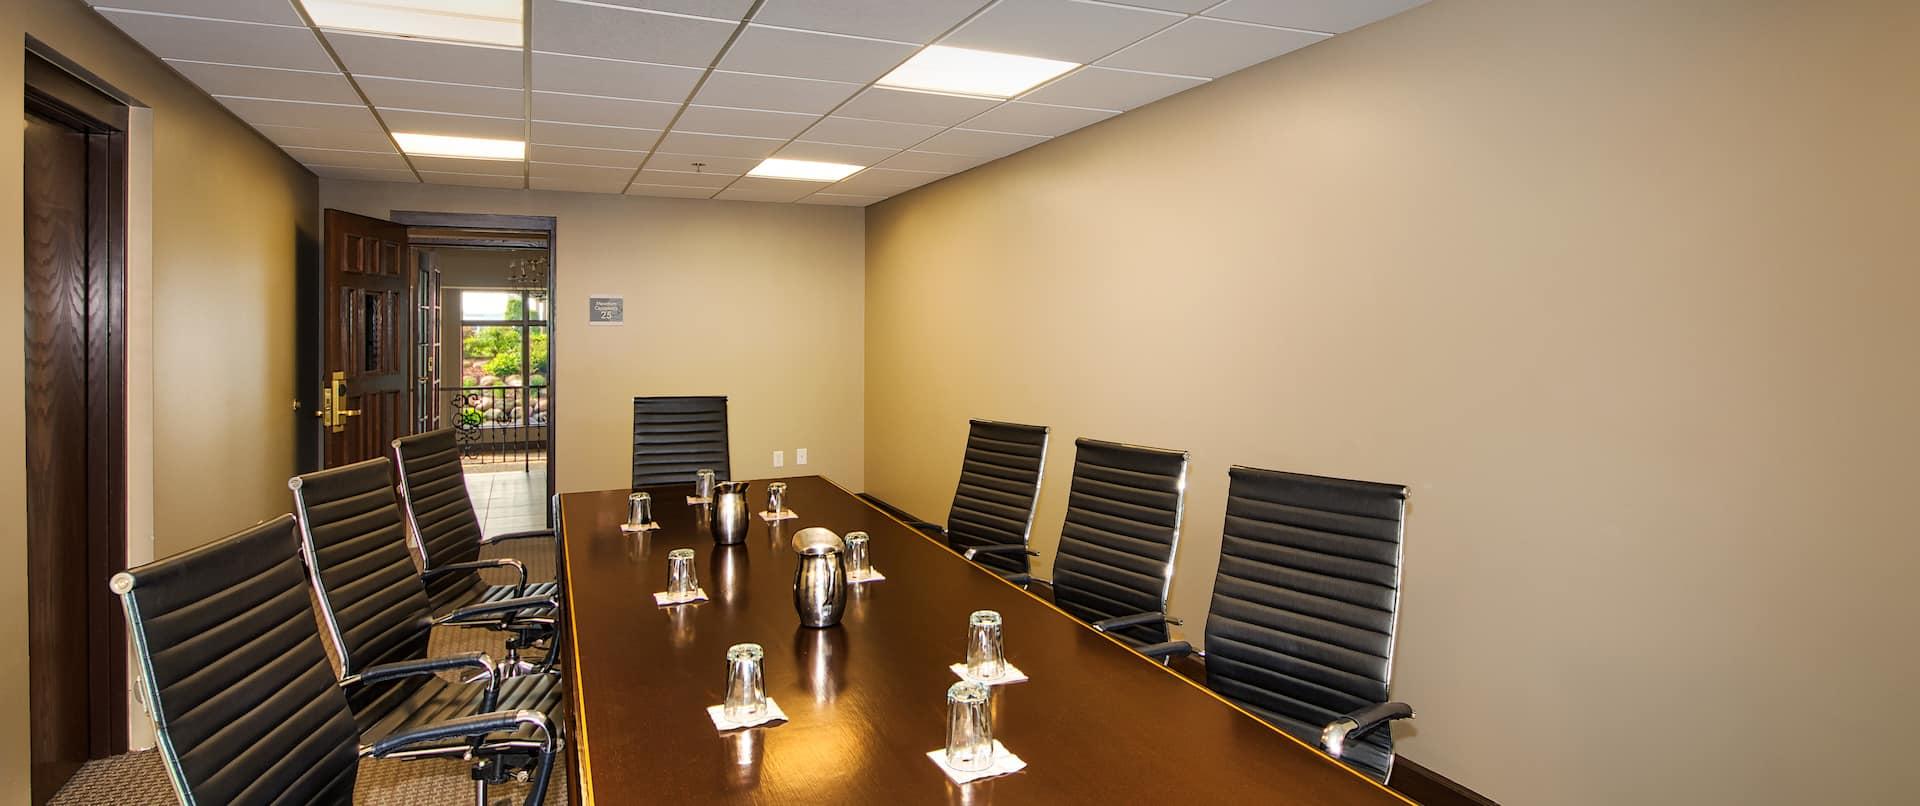 Wheelhouse Meeting Room